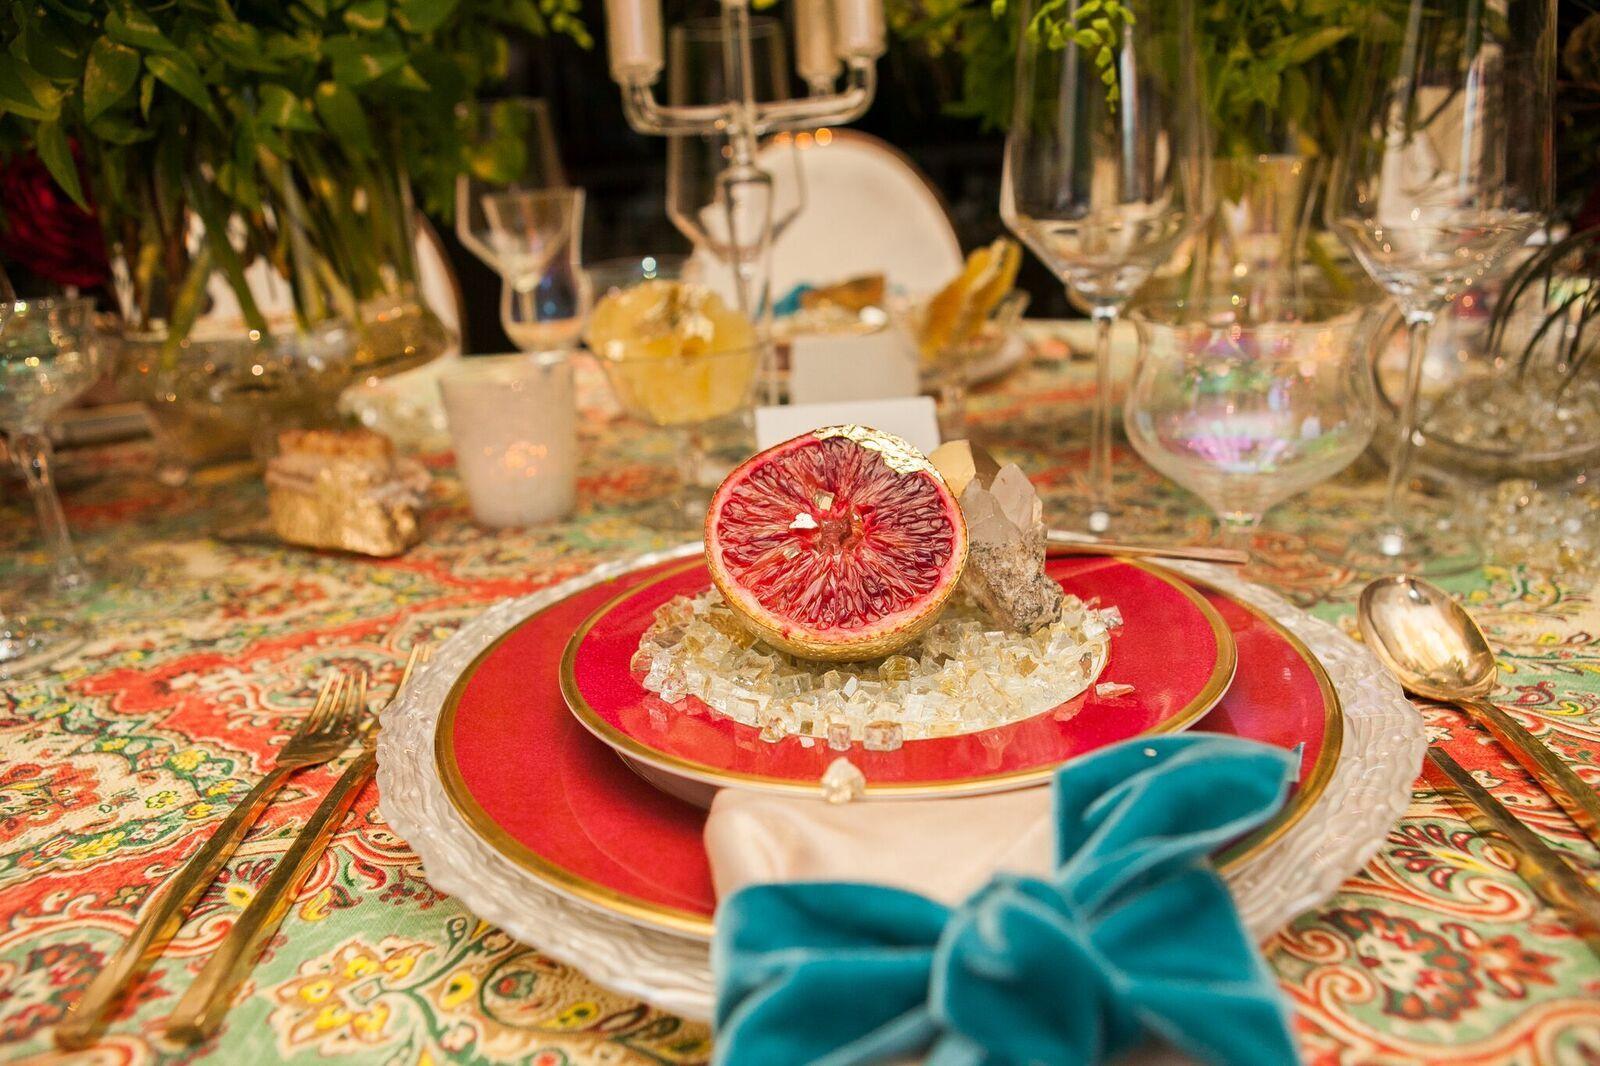 Styled Boho Chic Wedding Tabletop Shoot